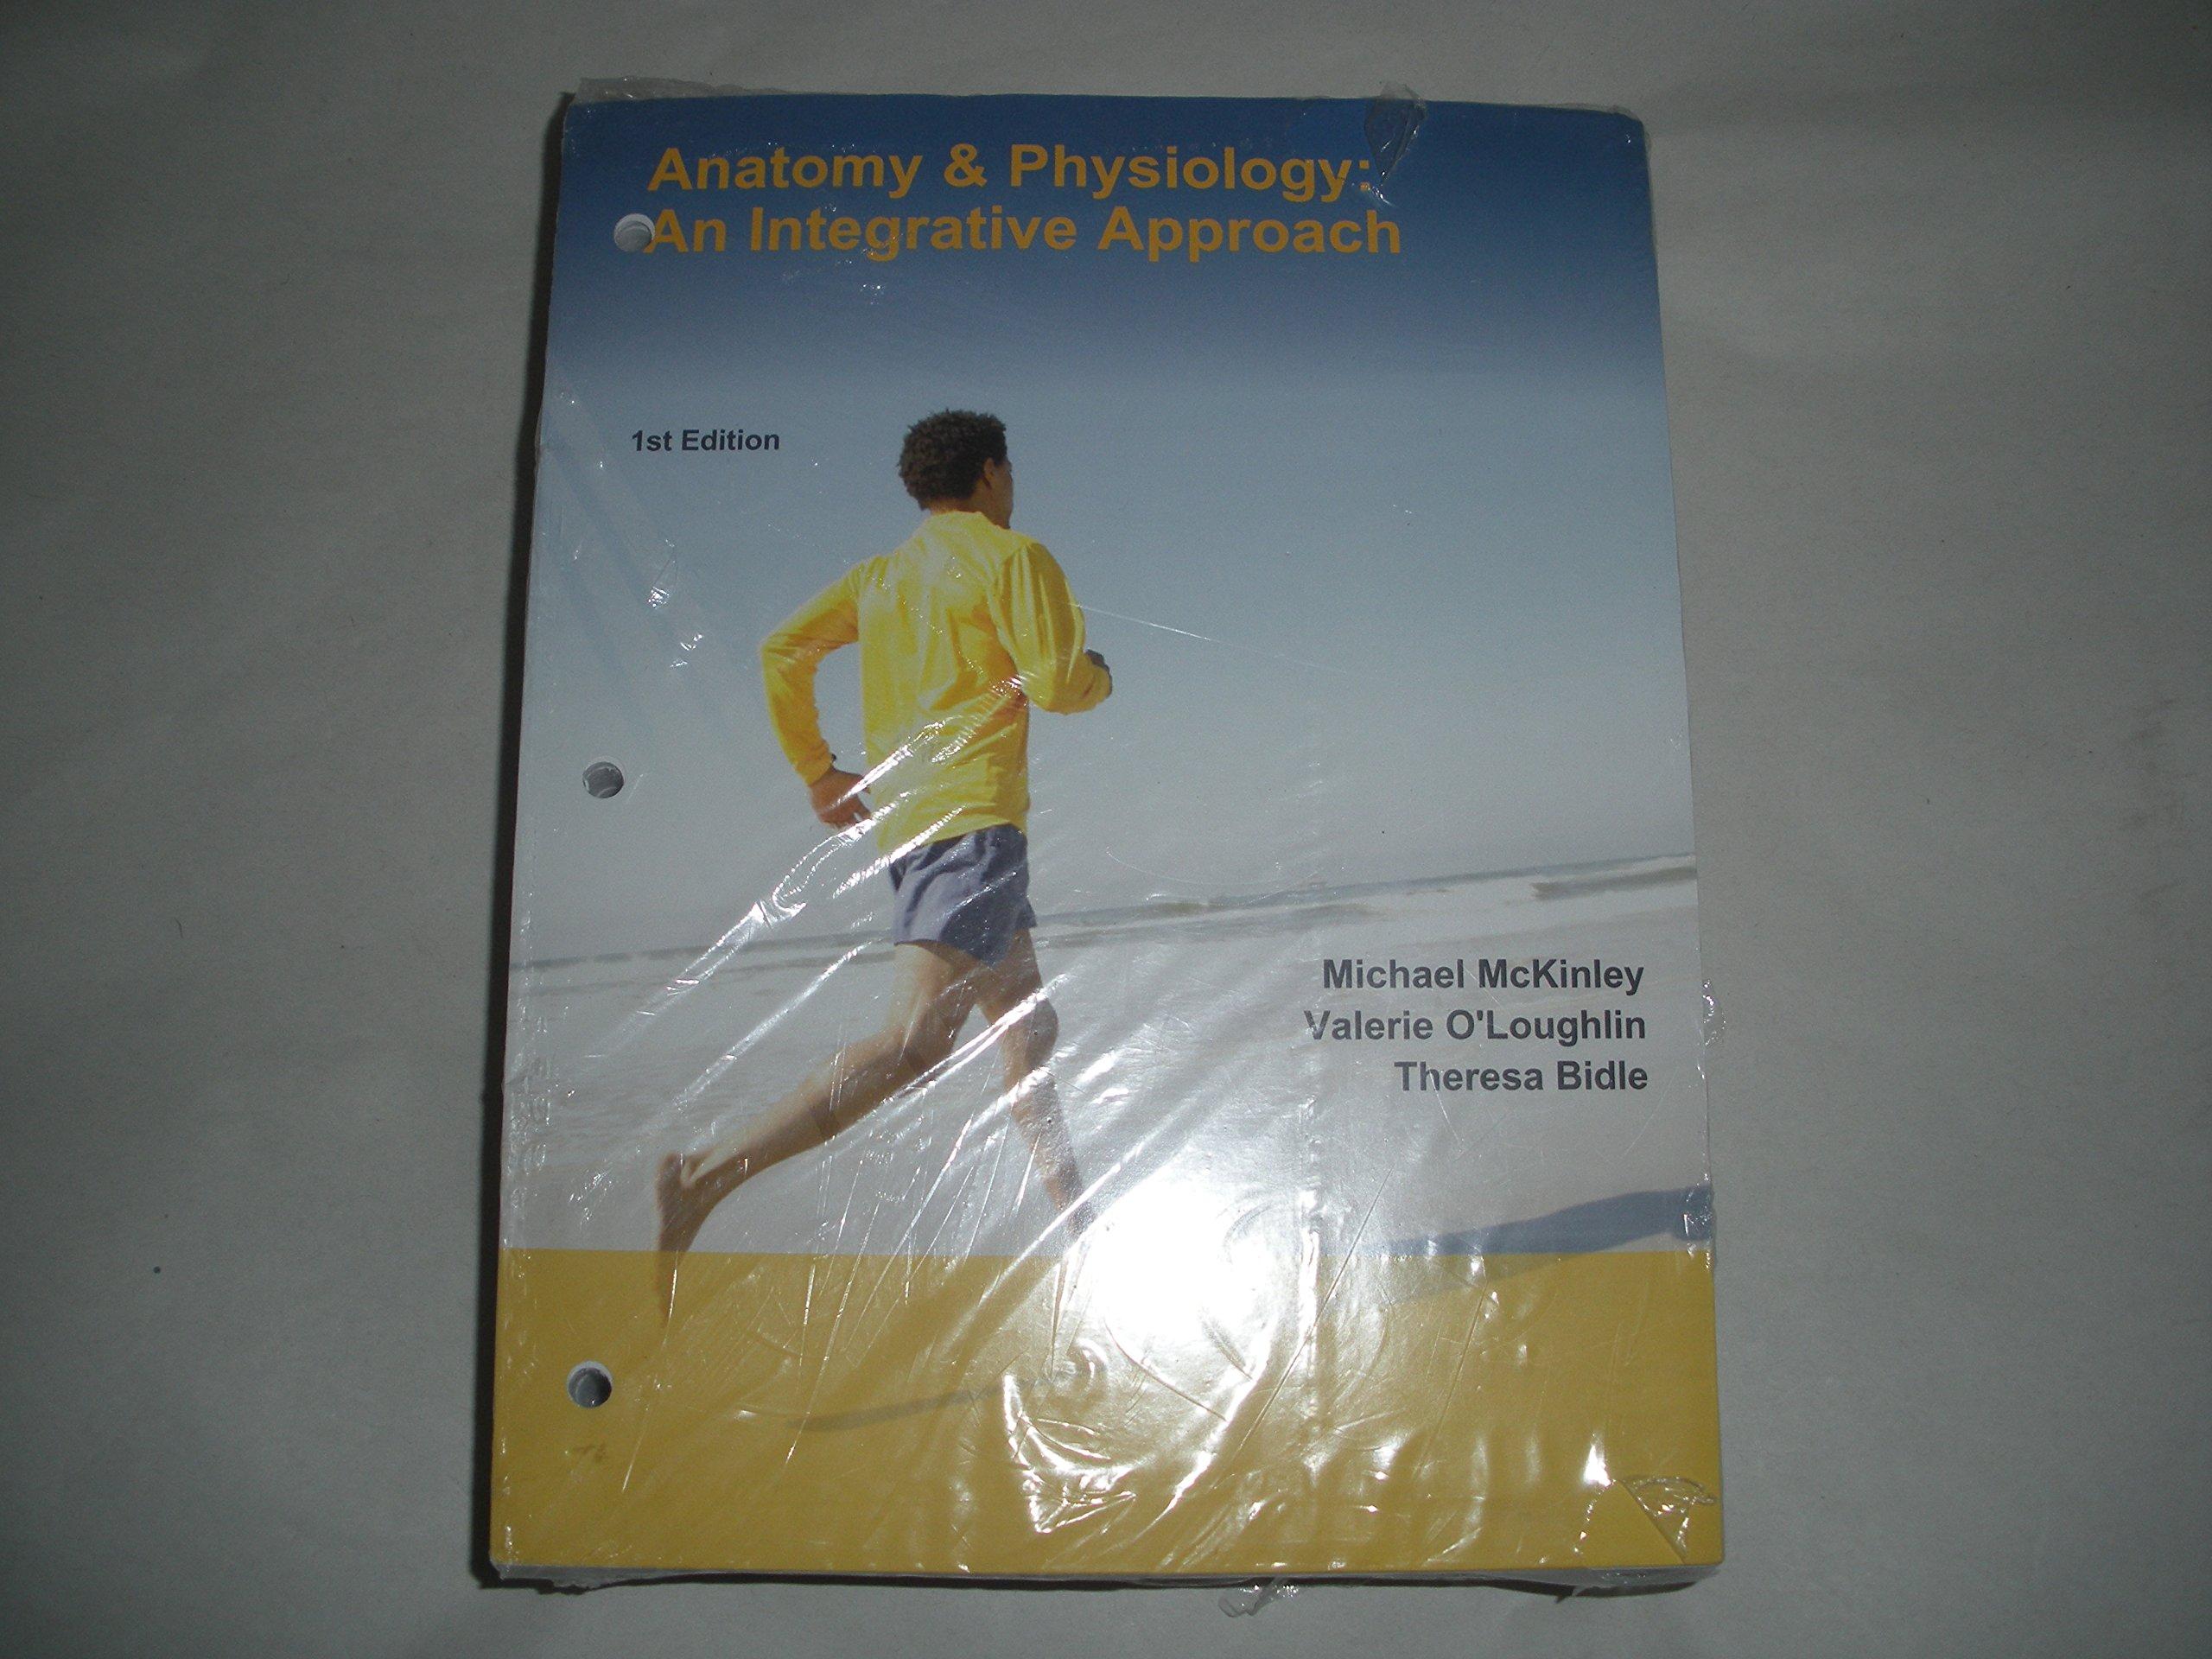 Anatomy & Physiology An Integrative Approach Custom Edition: Valerie  O'Loughlin, Theresa Bidle Michael McKinley: 9781259445149: Amazon.com: Books